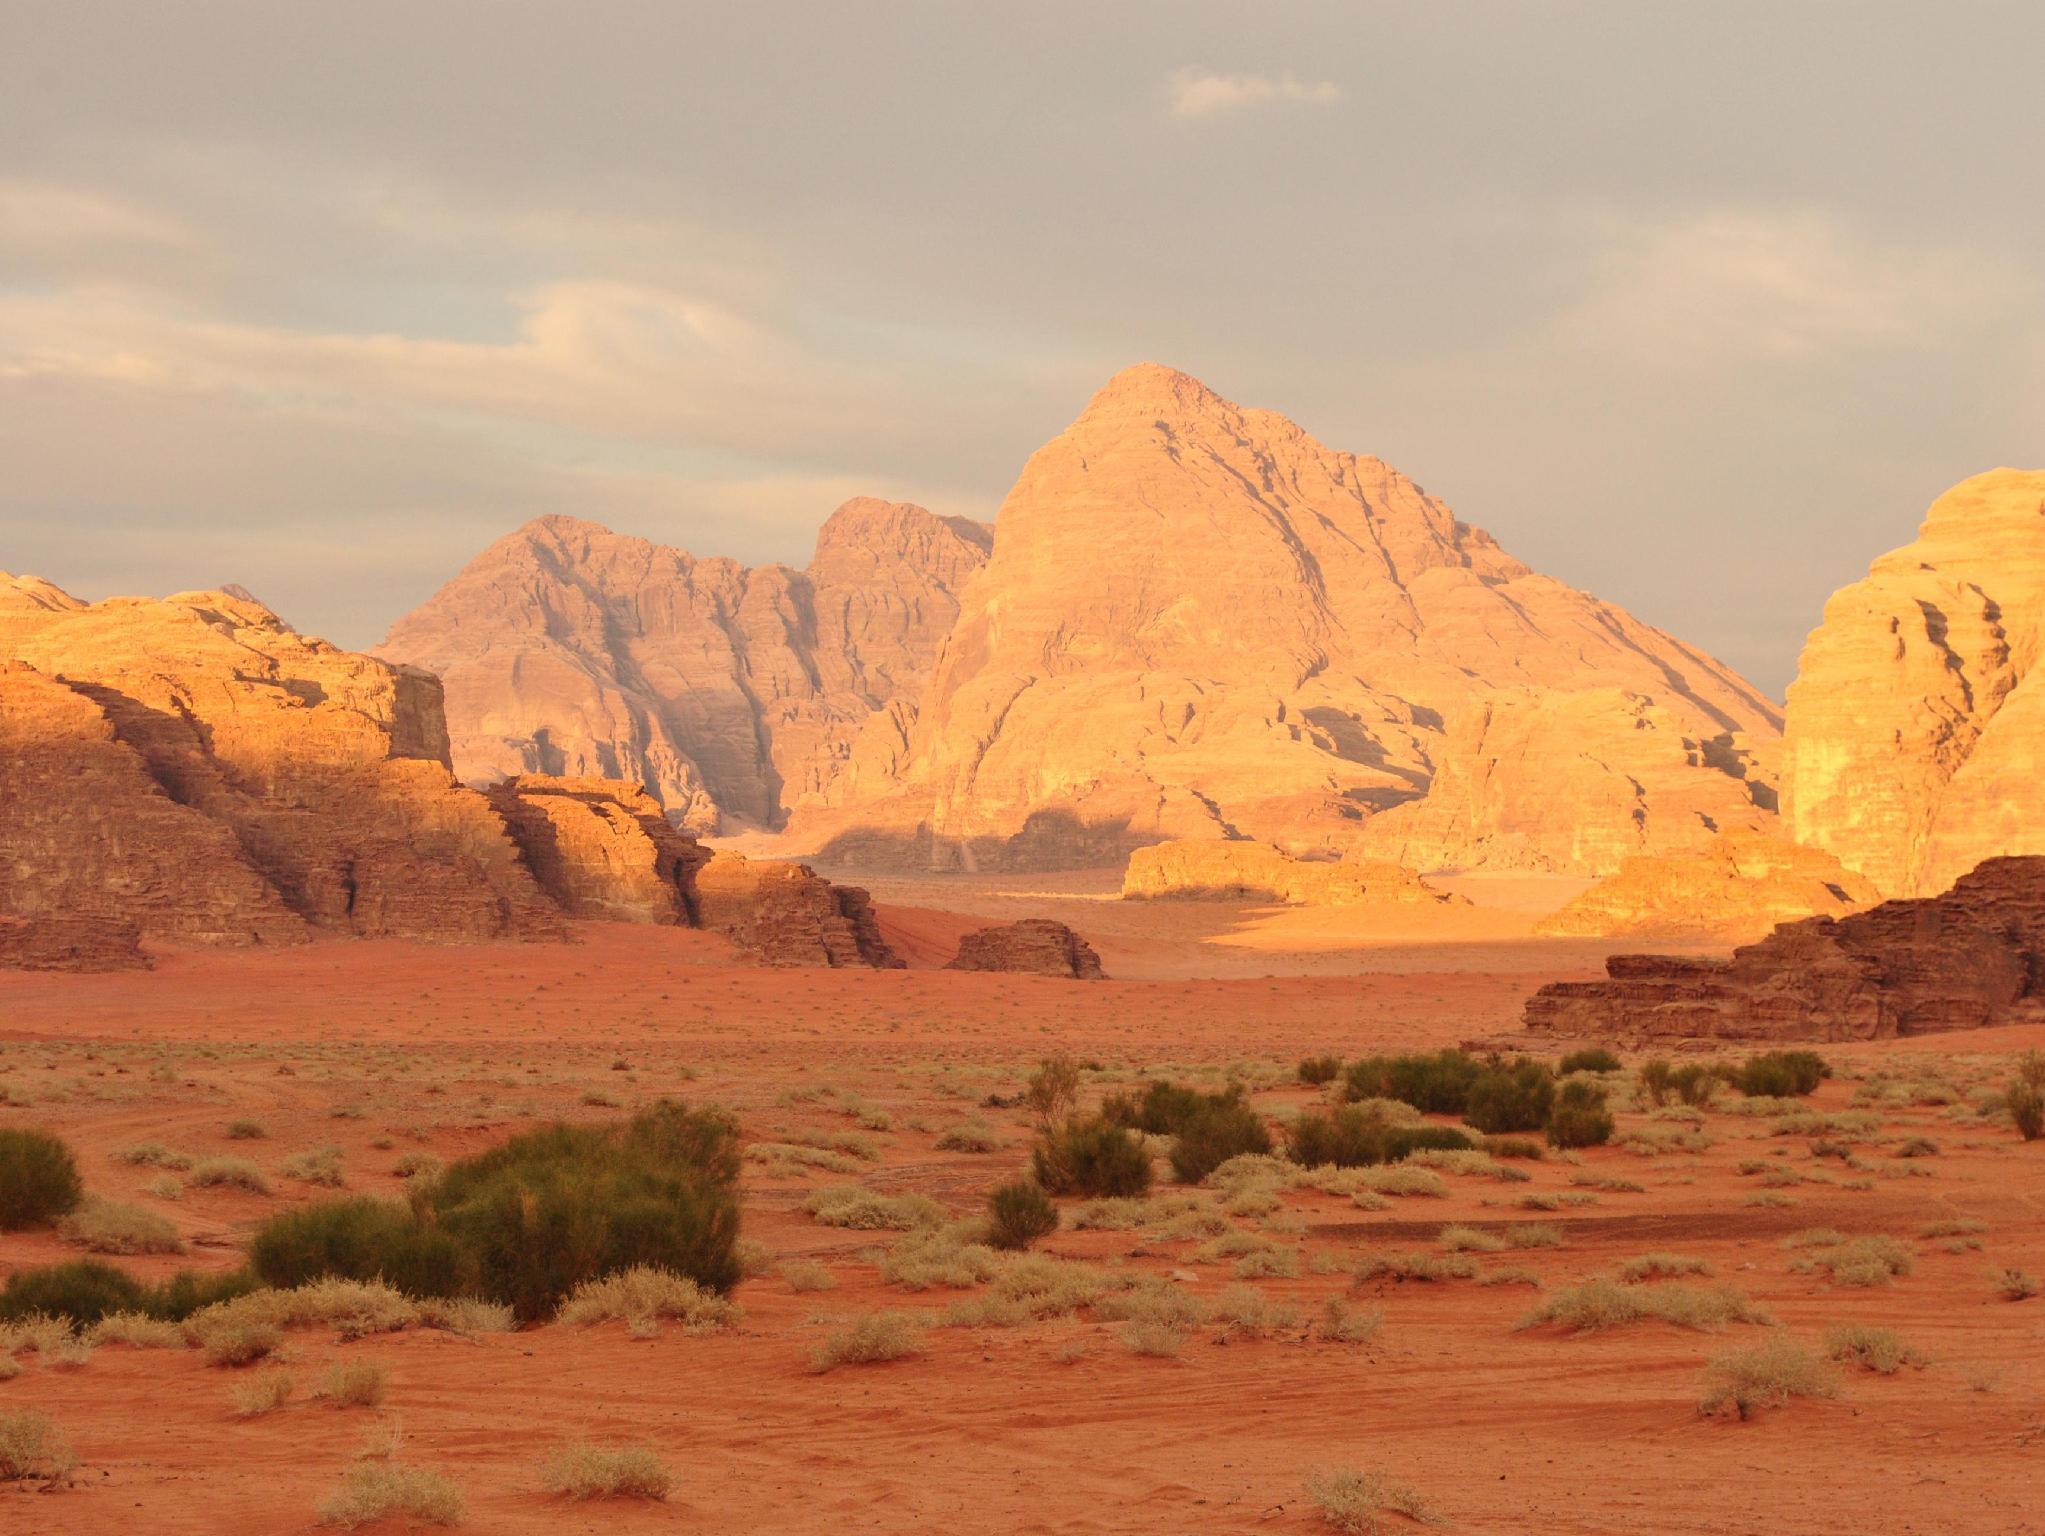 Wadi Rum Lawrence Camp, Quaira